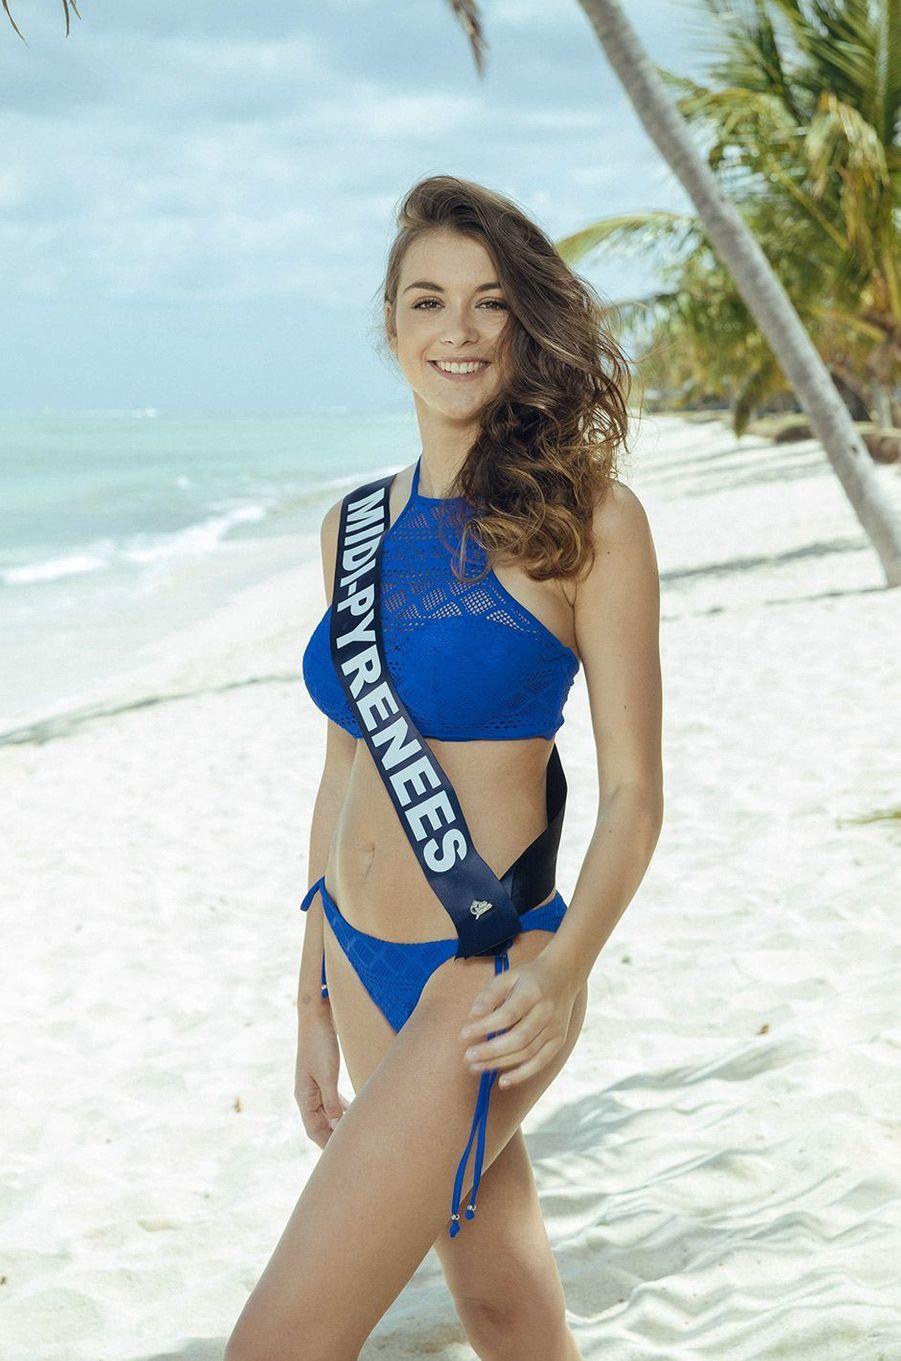 Axelle Breil, Miss Midi-Pyrénées 2018